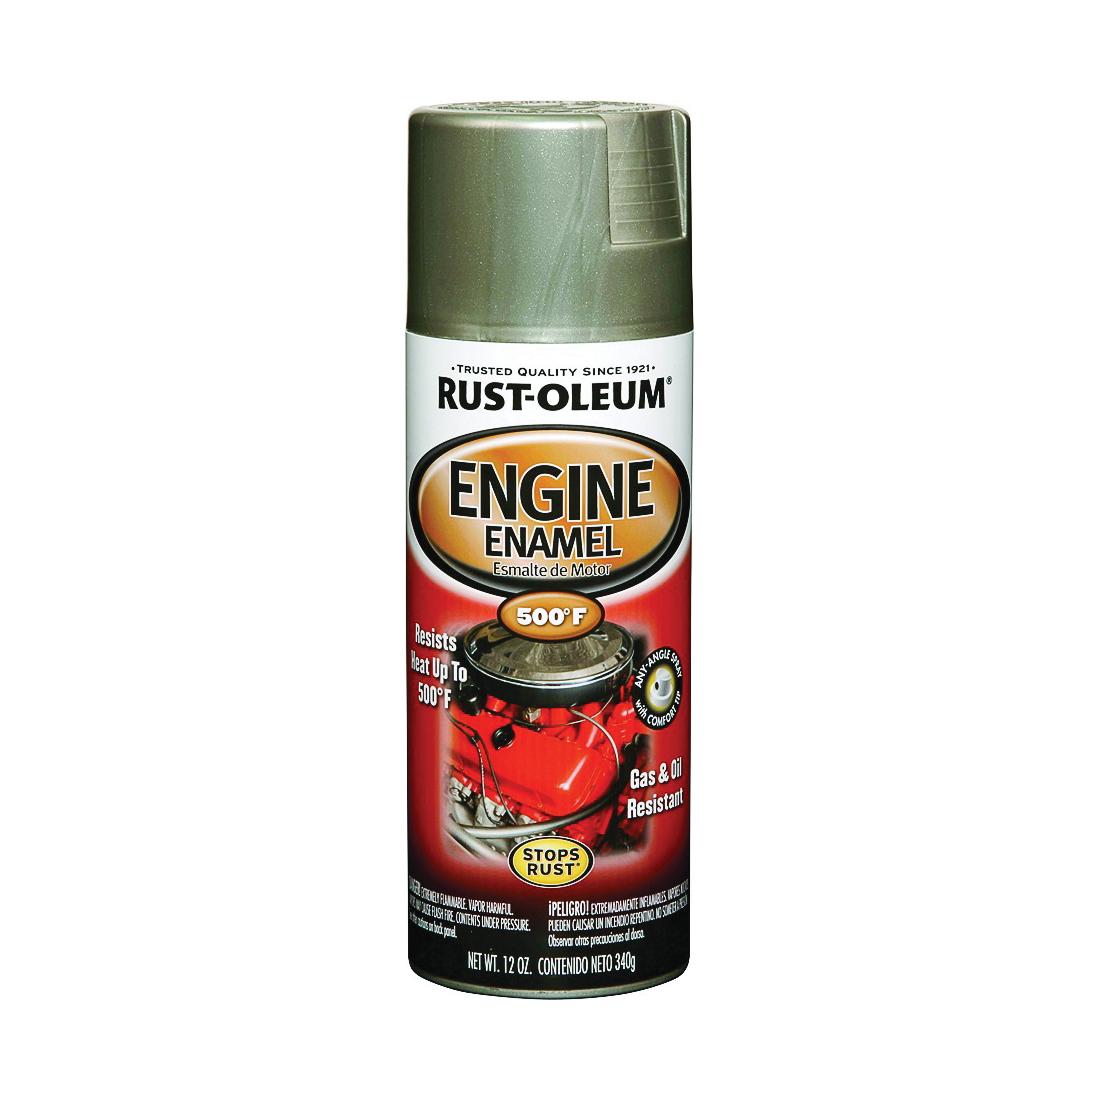 Picture of RUST-OLEUM AUTOMOTIVE 248949 Engine Enamel Spray Paint, Aluminum, 11 oz, Aerosol Can